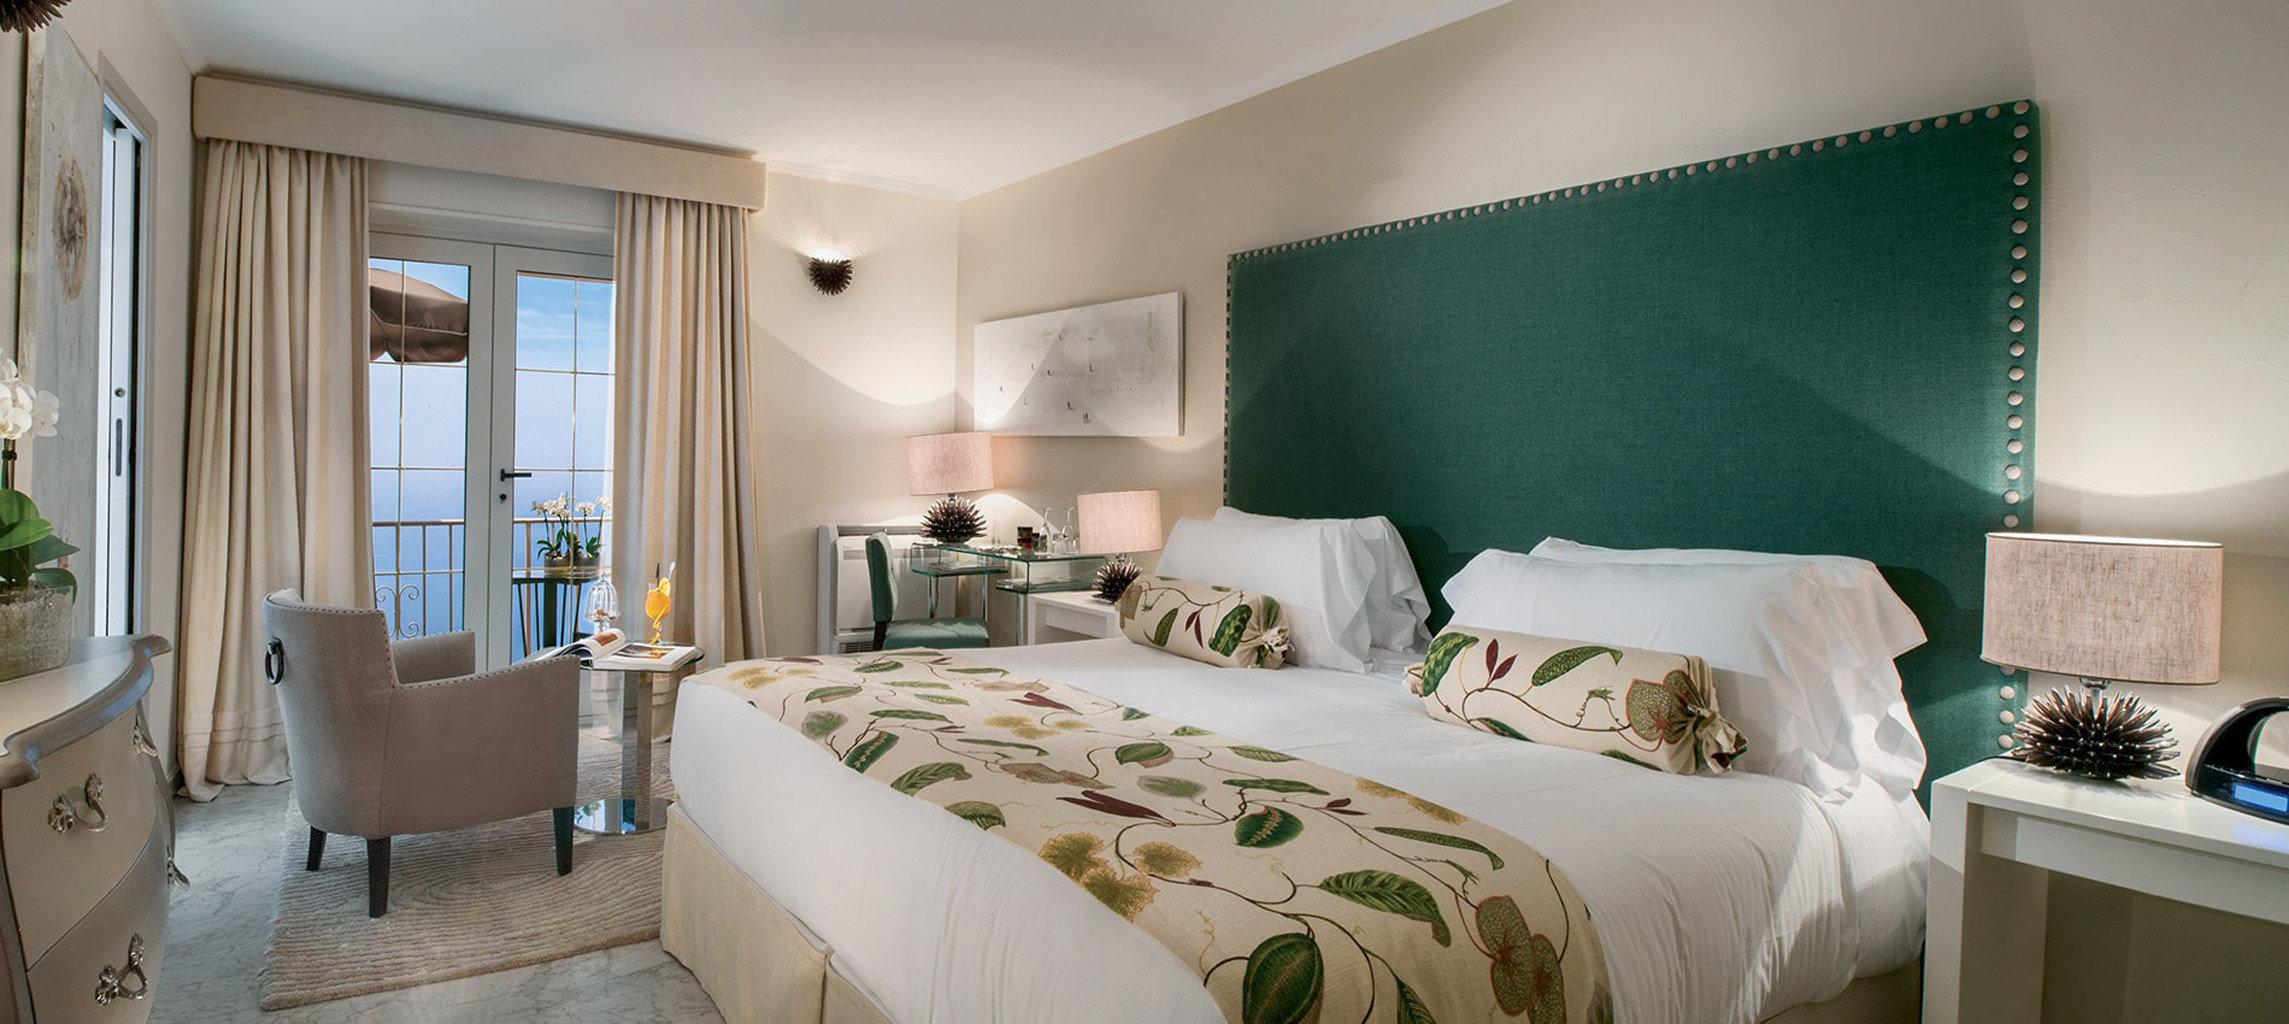 sofa Bedroom property Suite green condominium home cottage pillow living room Villa